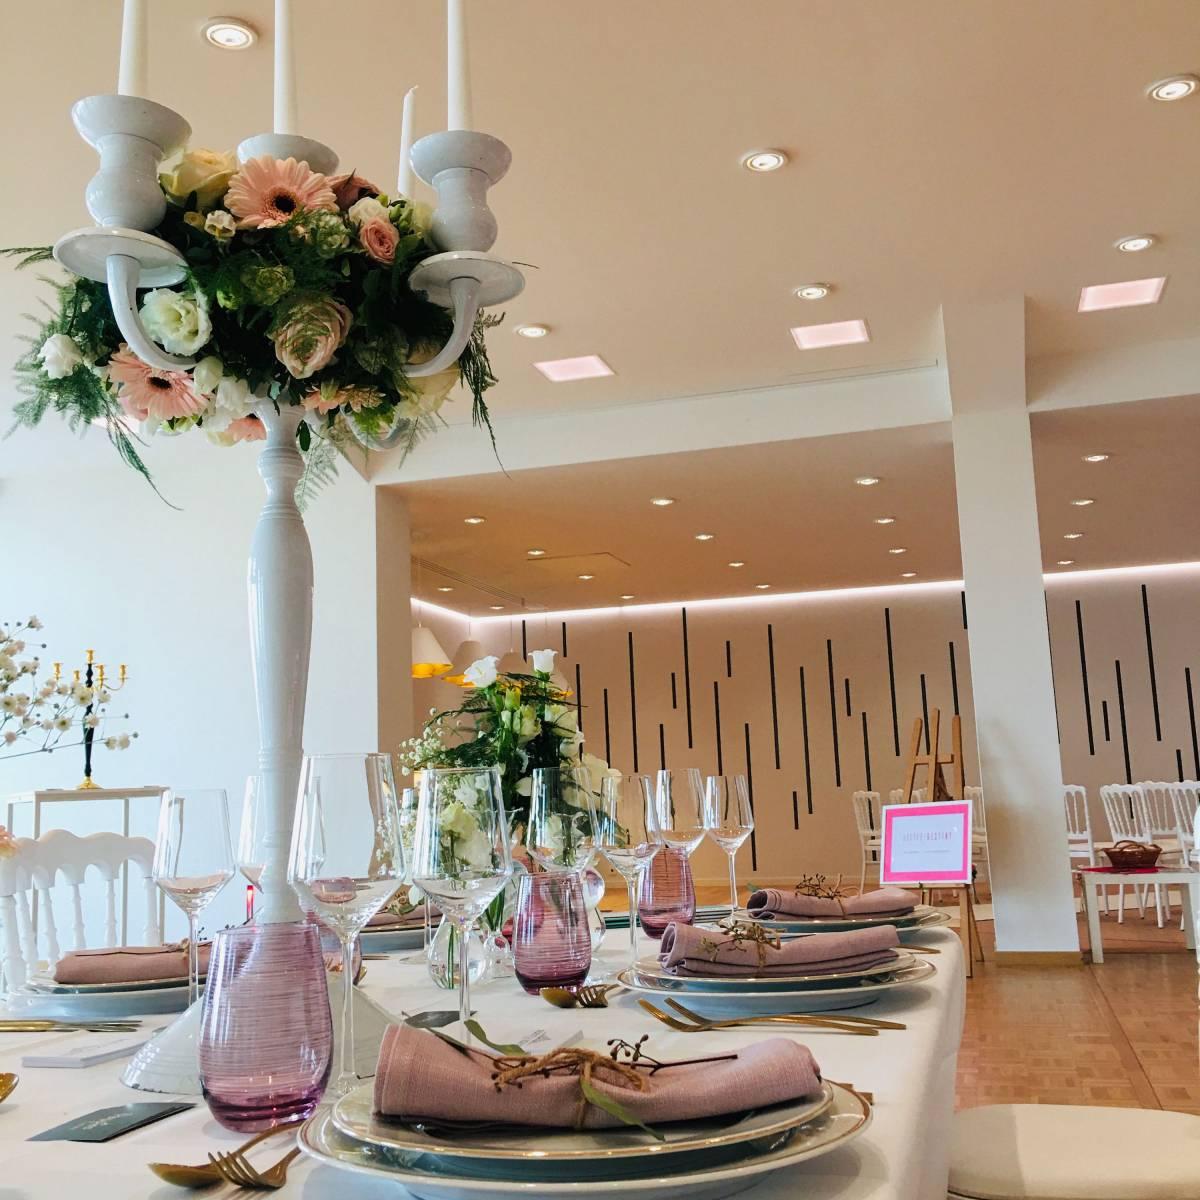 Maison Fleurie - Fotograaf zelfgetrokken - House of Weddings - 8